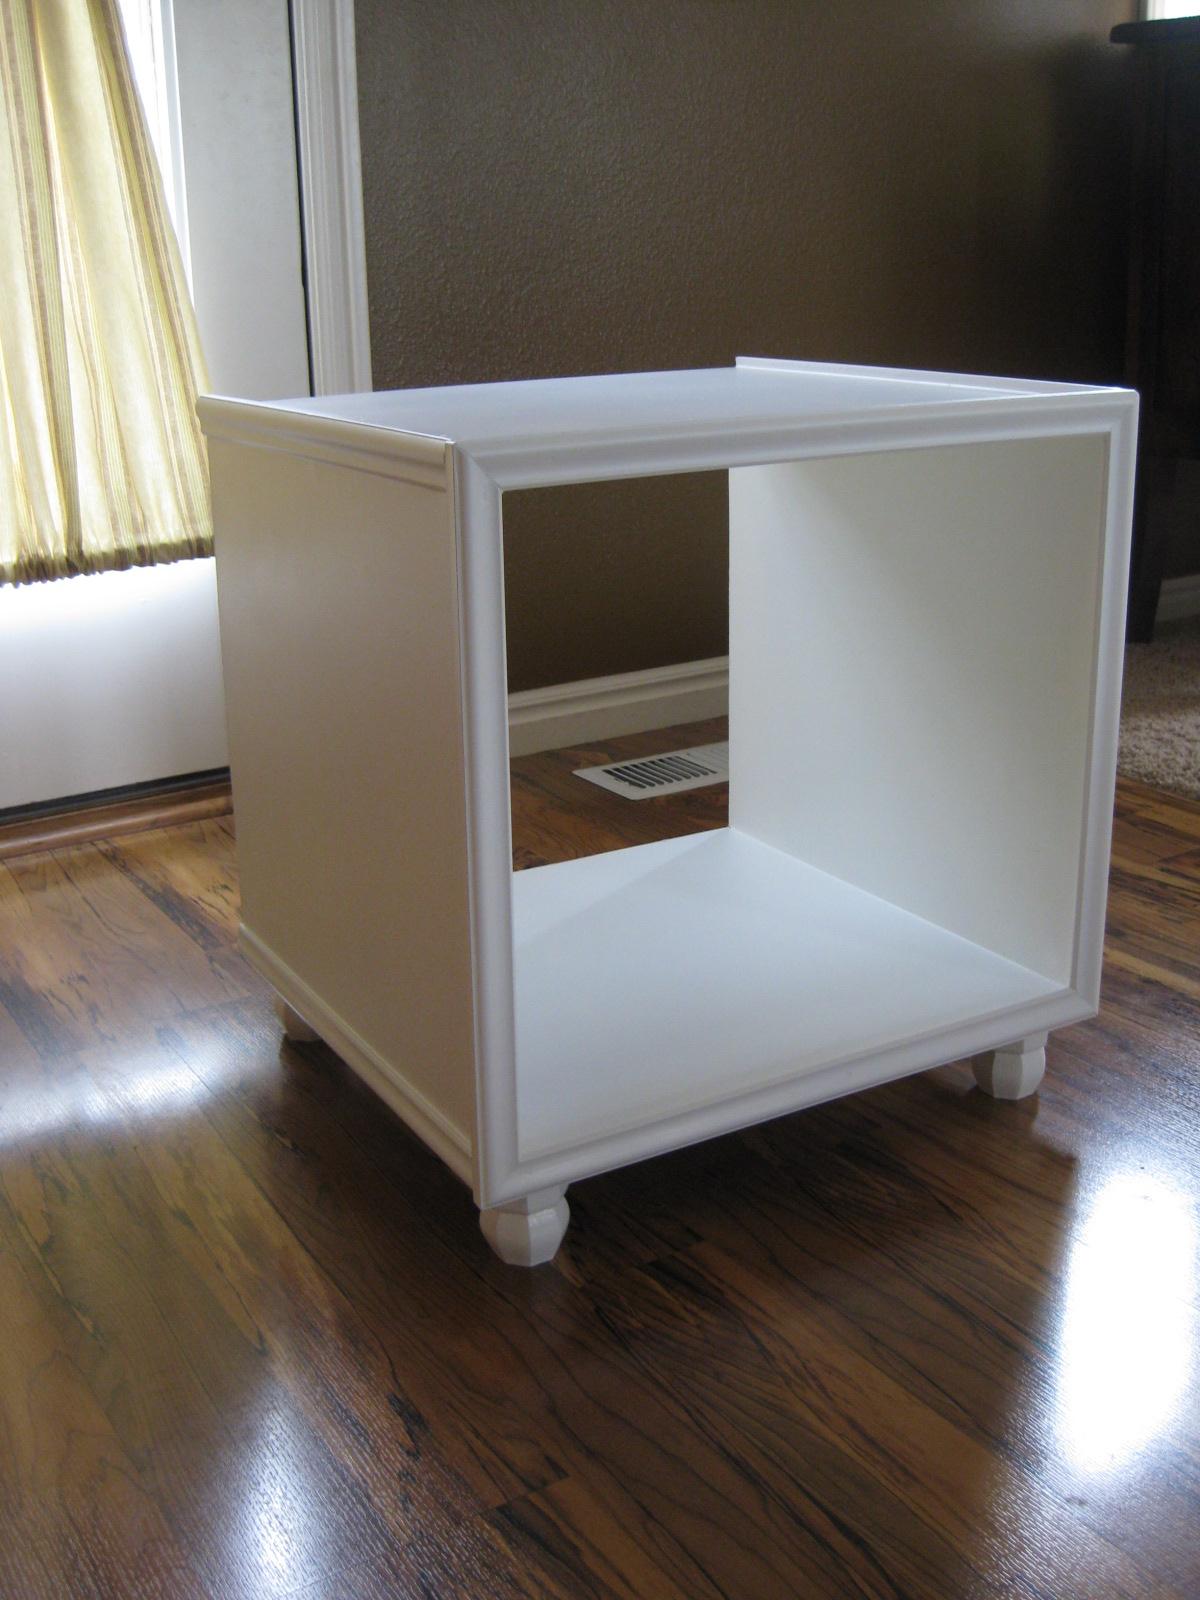 Tda Decorating And Design Diy Printer Hard Drive Storage